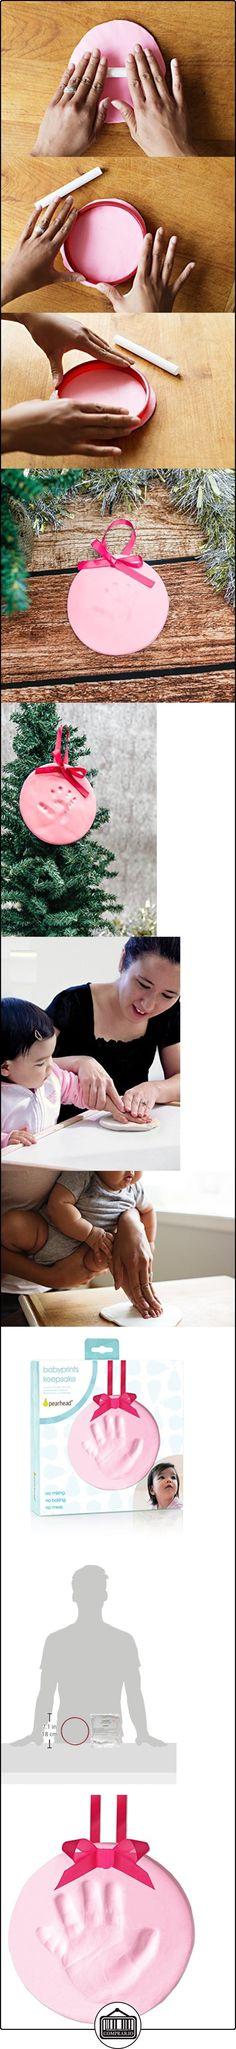 Pearhead Easy-to-Create Babyprints Baby Handprint or Footprint Keepsake Ornament Kit with Ribbon, Pink by Pearhead  ✿ Regalos para recién nacidos - Bebes ✿ ▬► Ver oferta: http://comprar.io/goto/B00L63QFMM